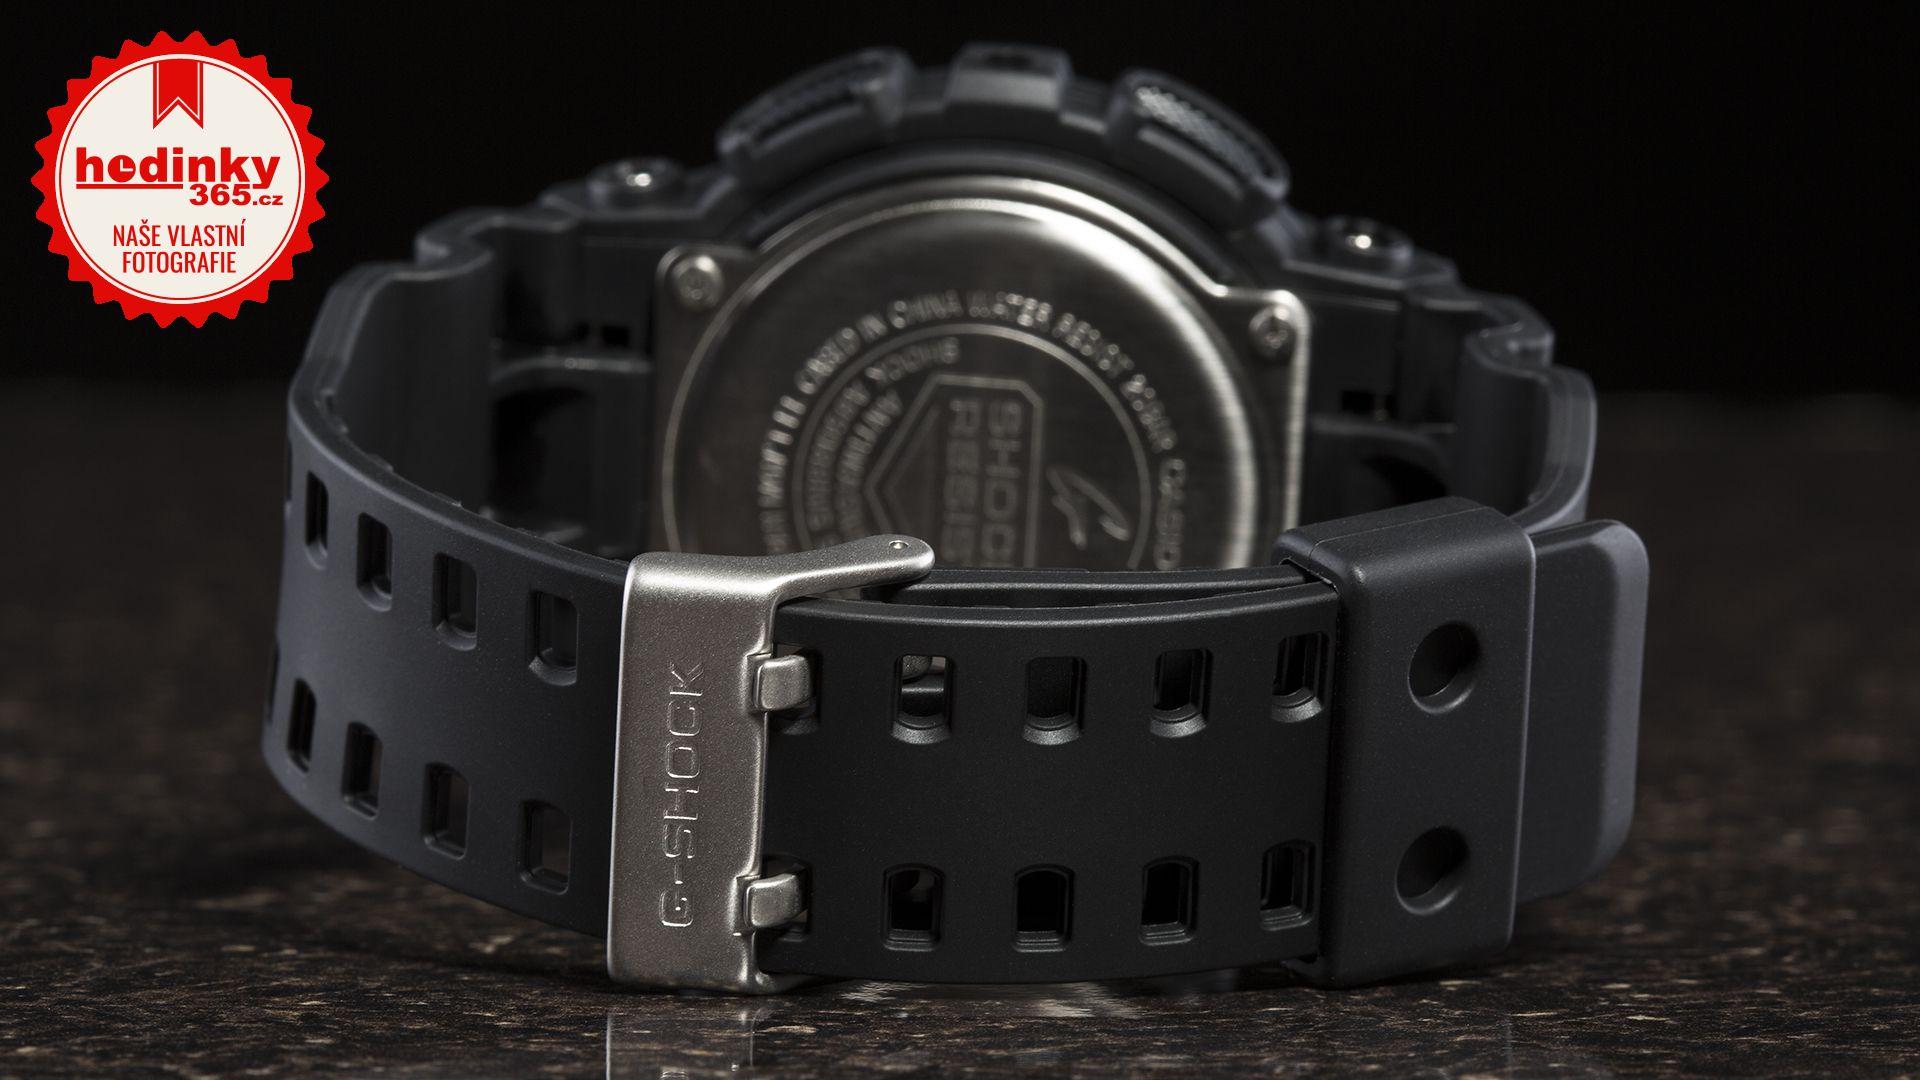 Xxx video hodinky